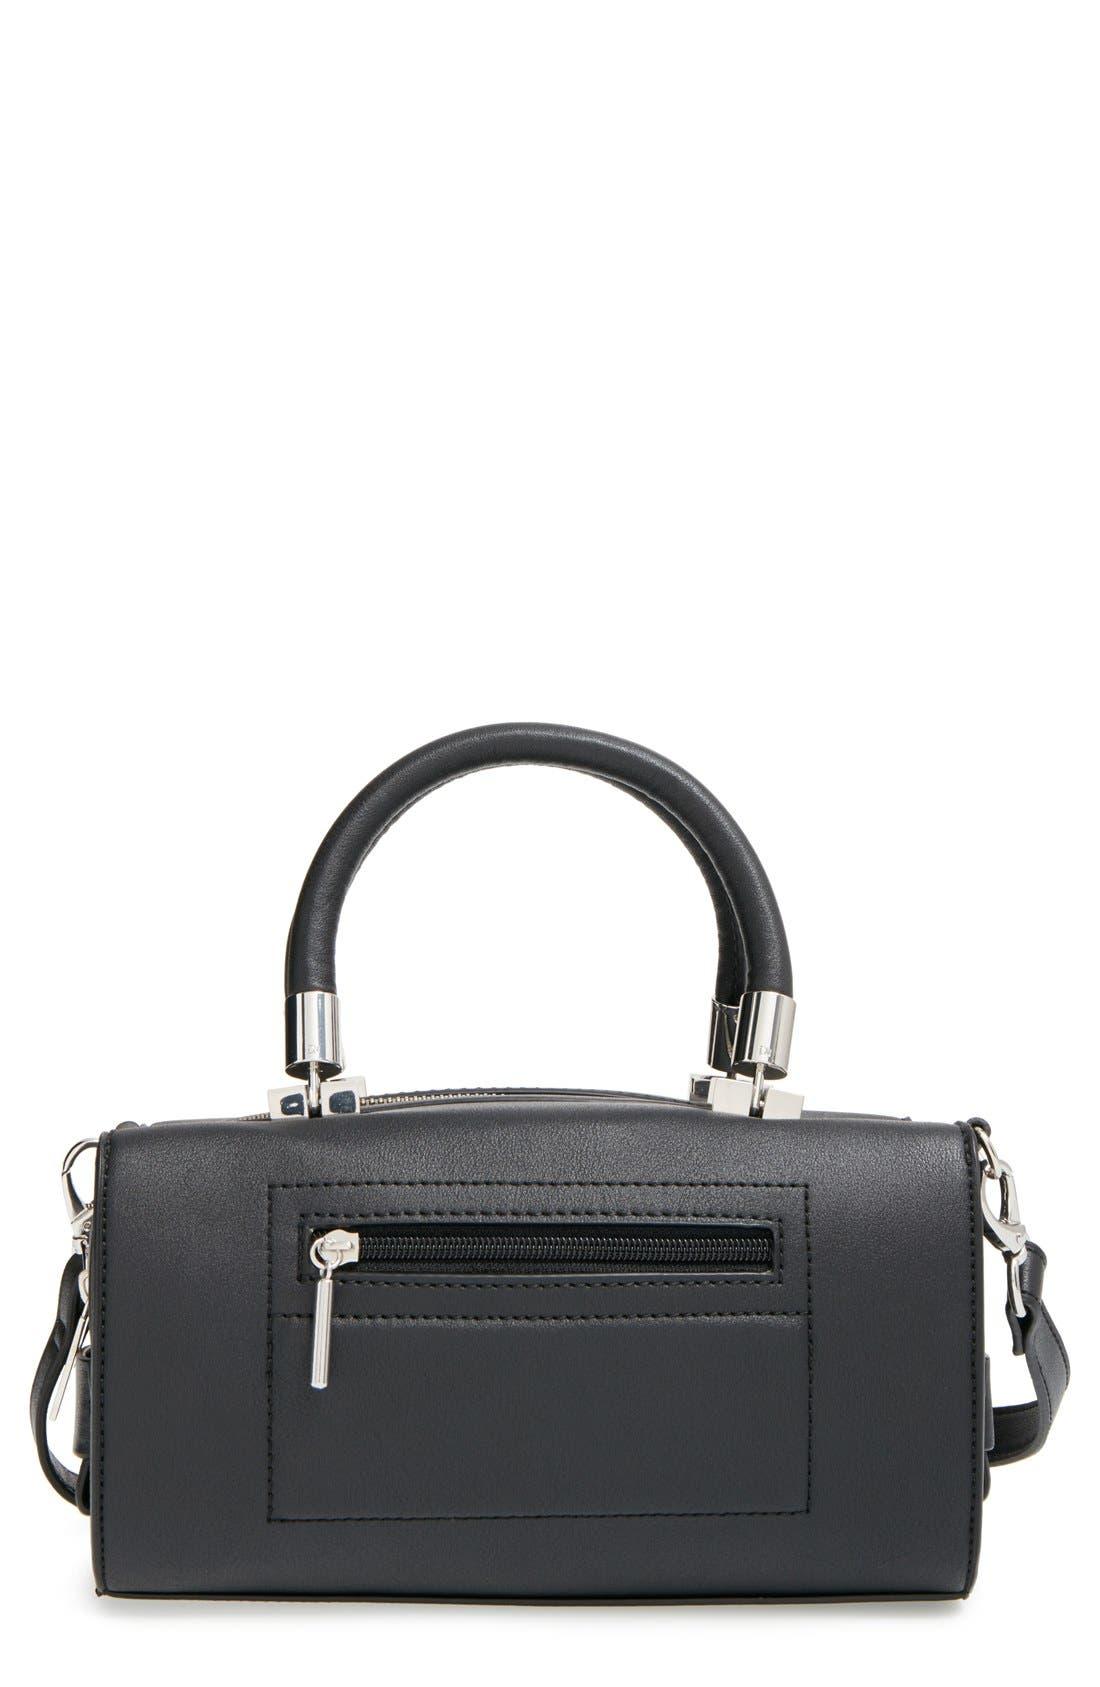 Alternate Image 1 Selected - Danielle Nicole 'Whitney' Faux Leather Crossbody Bag